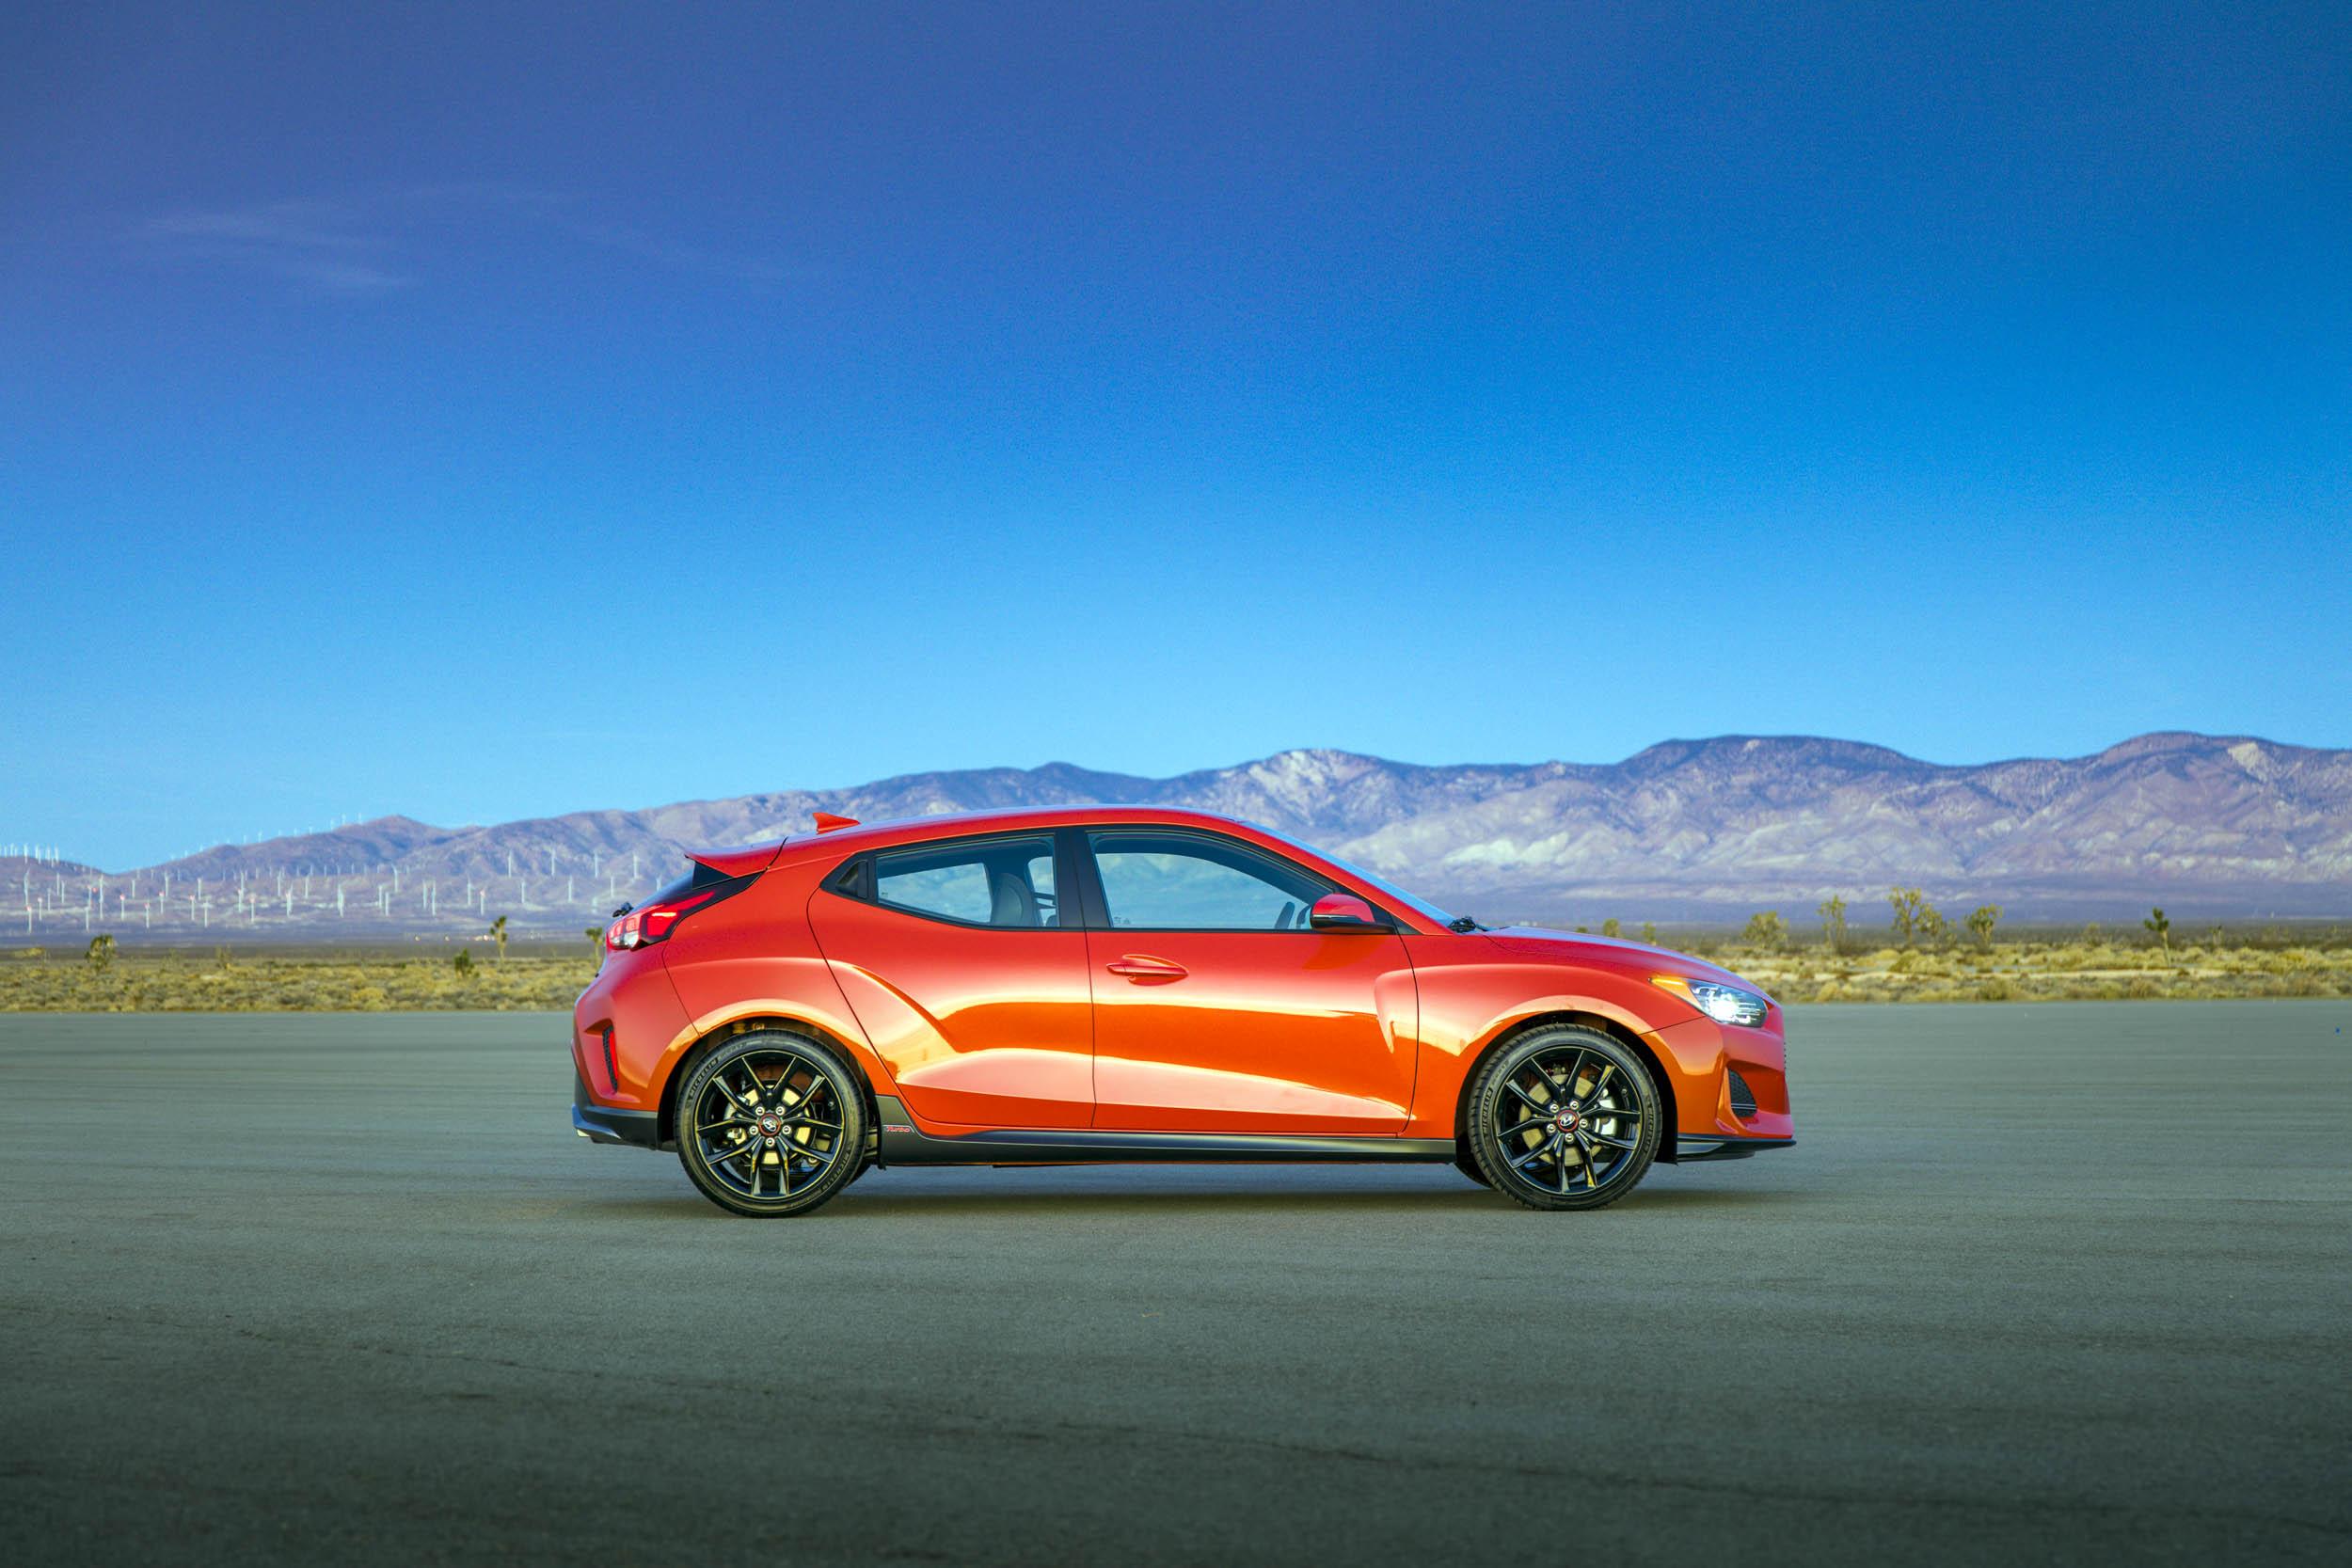 red 2019 Hyundai Veloster profile in the desert